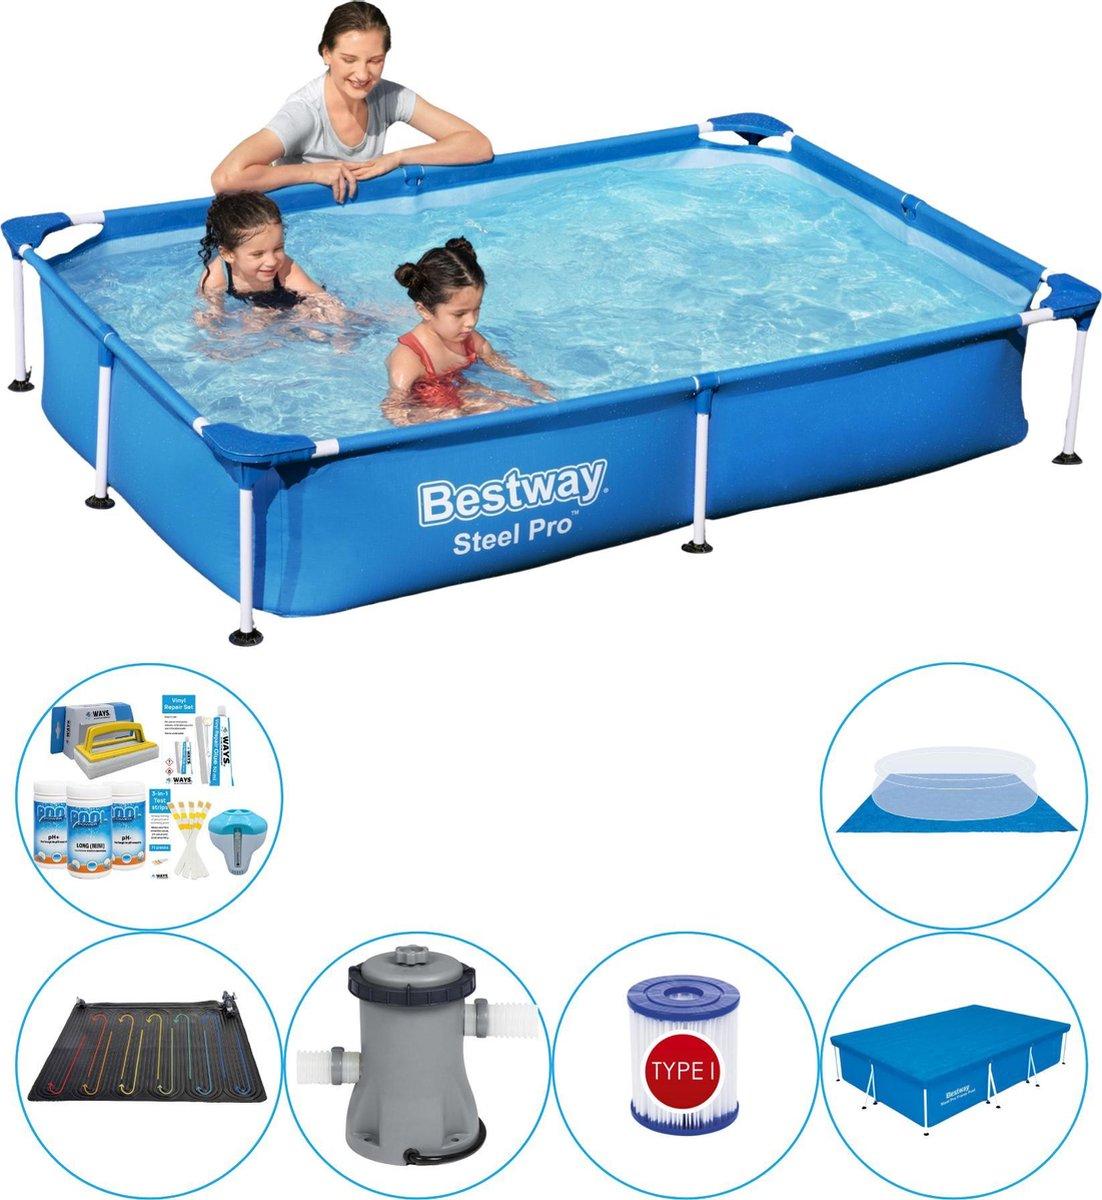 Bestway zwembad - Frame Pool - Super Deal - 220 x 150 x 43 cm - blauw